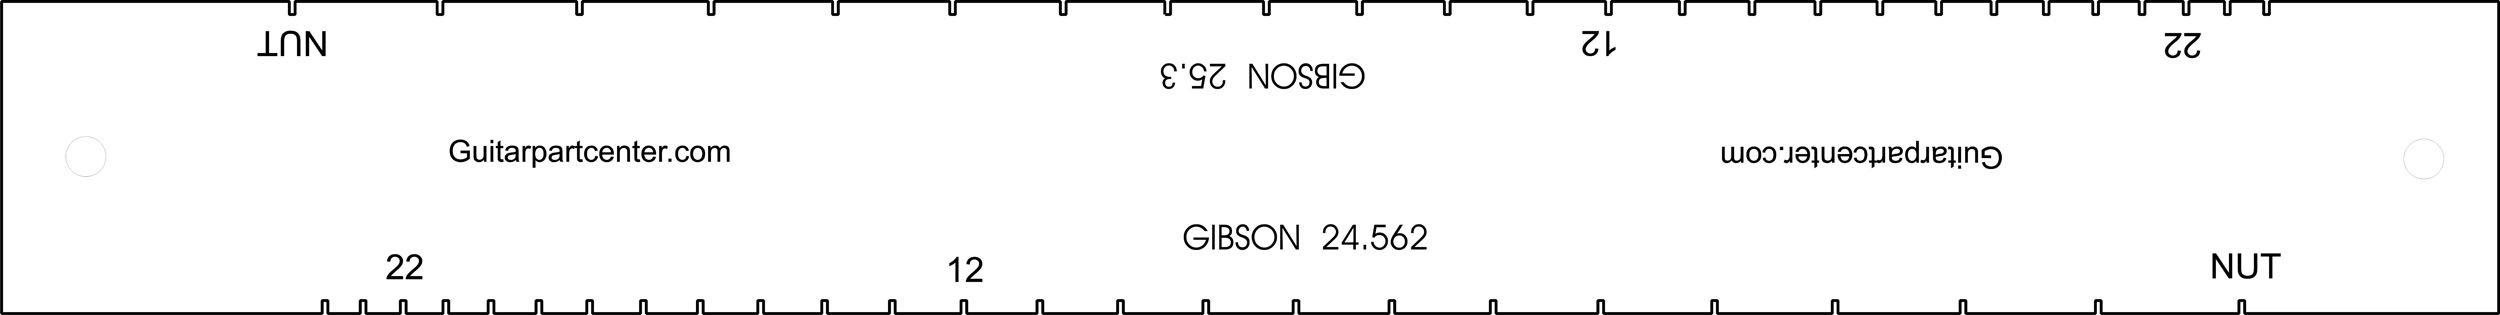 Dual Scal Fingerboard Slotting Template - 24.562'' & 25.3''